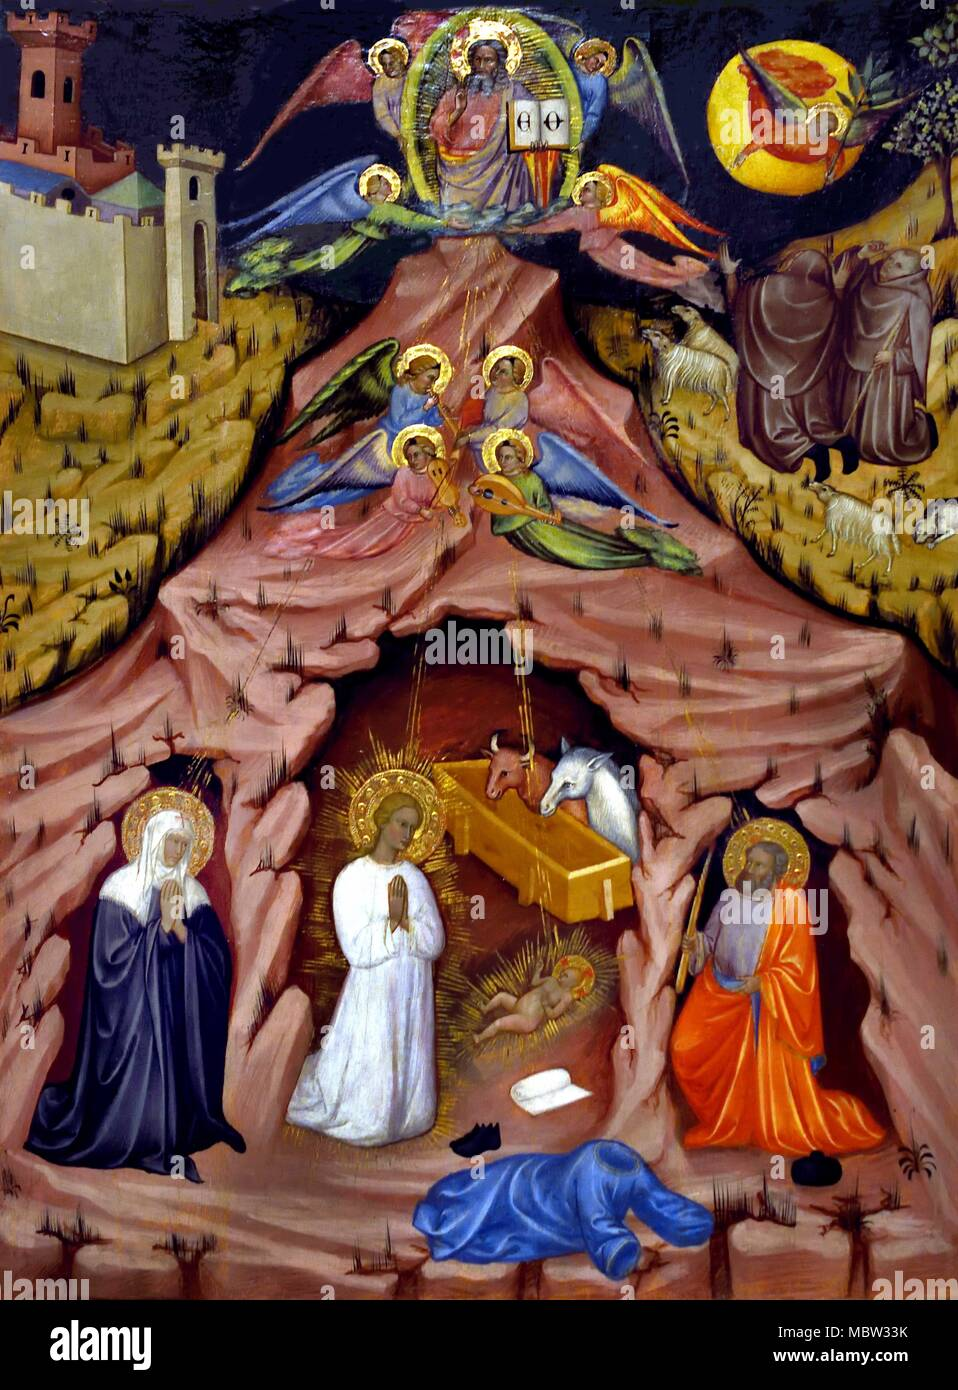 Visione di Santa Brigida - Vision de Saint Brigid, 1372 byTurino di Vanni 14-15ème siècle Italie Italien Photo Stock